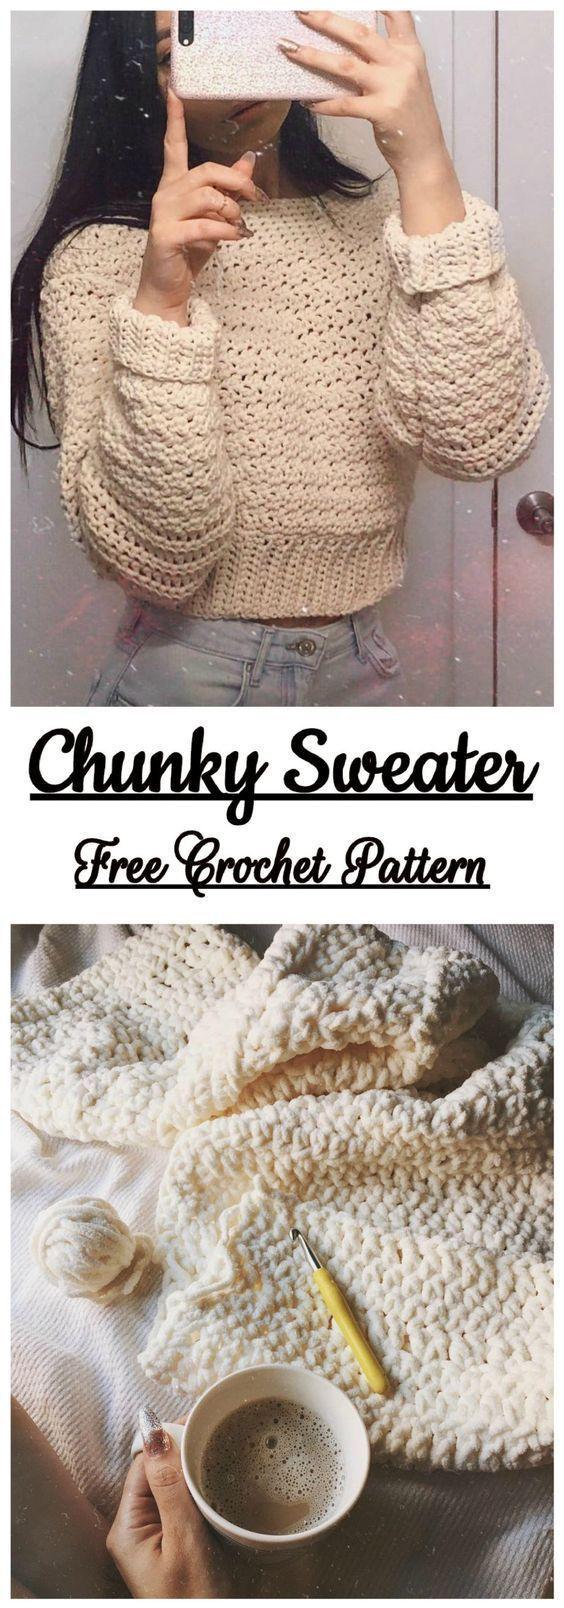 Chunky Sweater Free Crochet Padrão